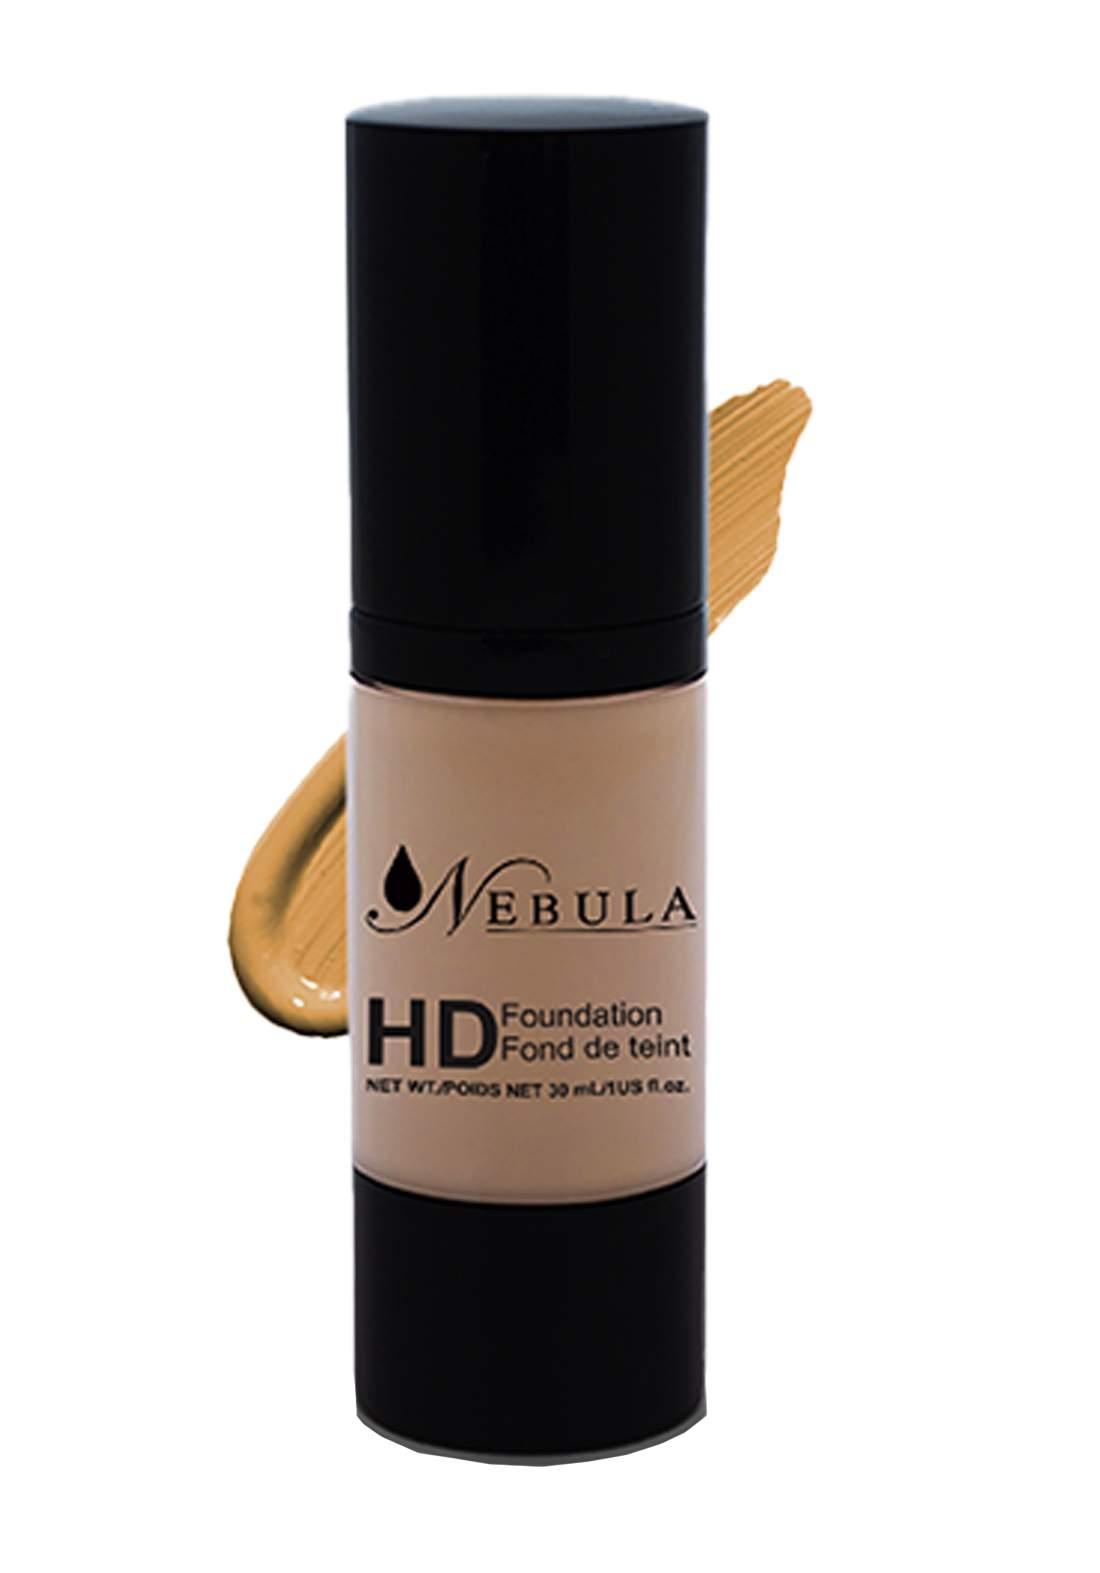 Nebula HD Liquid Fondation-30ml-151- Ivory اساس